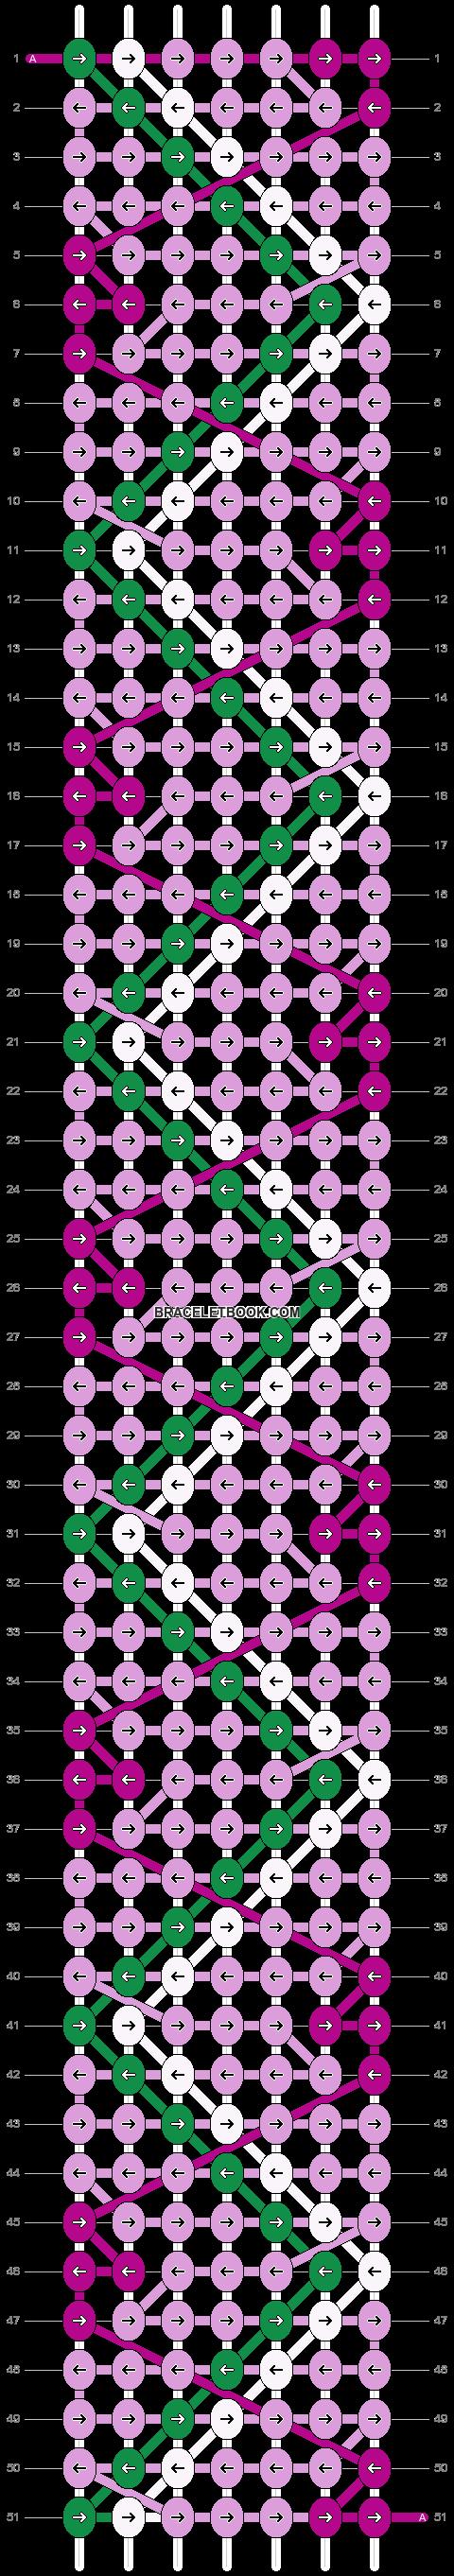 Alpha pattern #16069 pattern